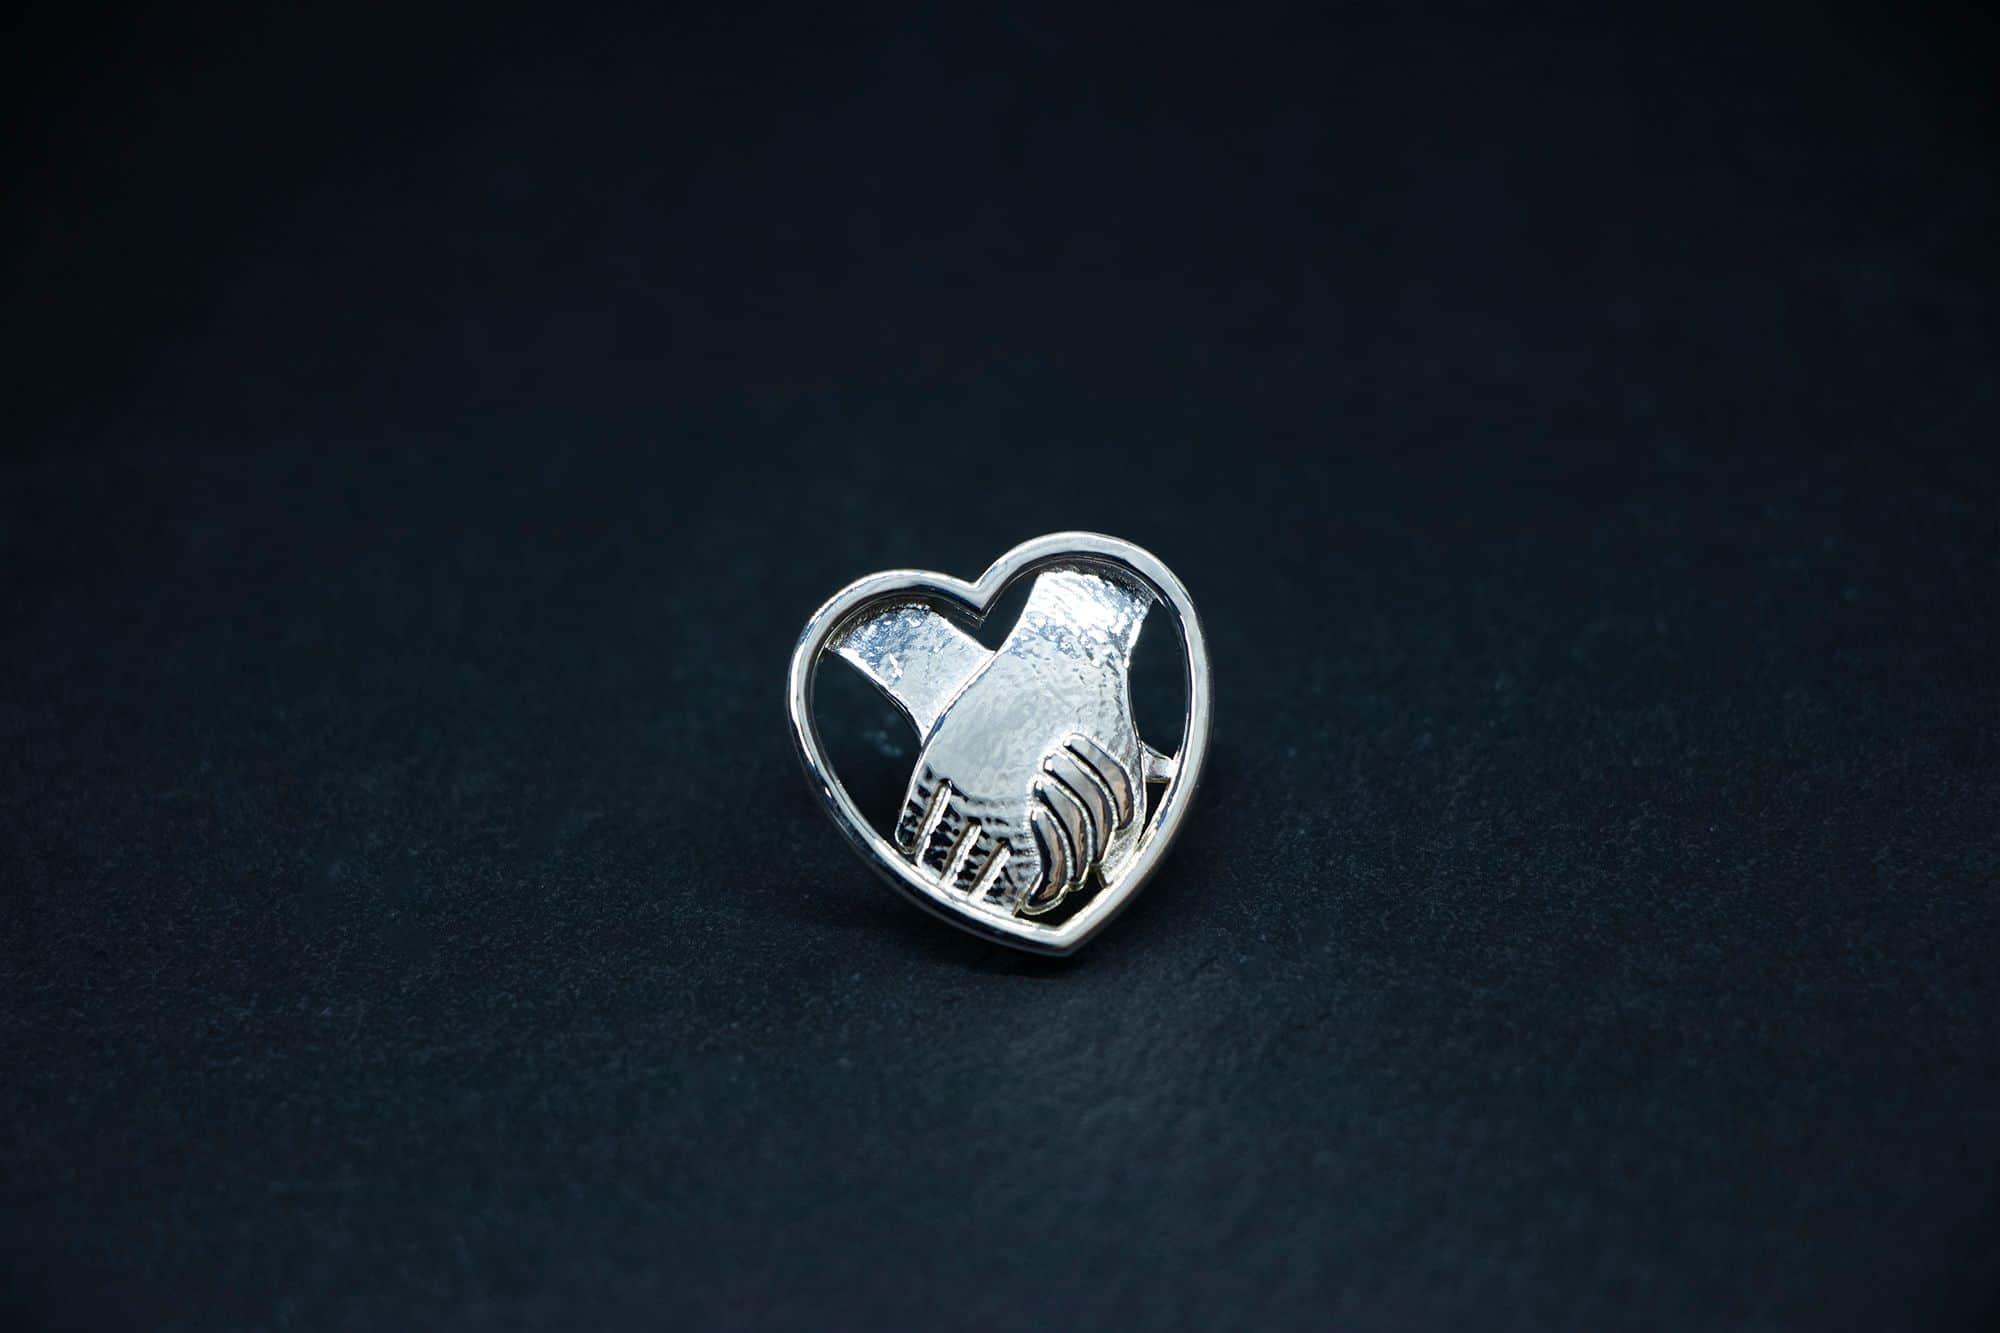 Pins of Praise jewellery, BAJ